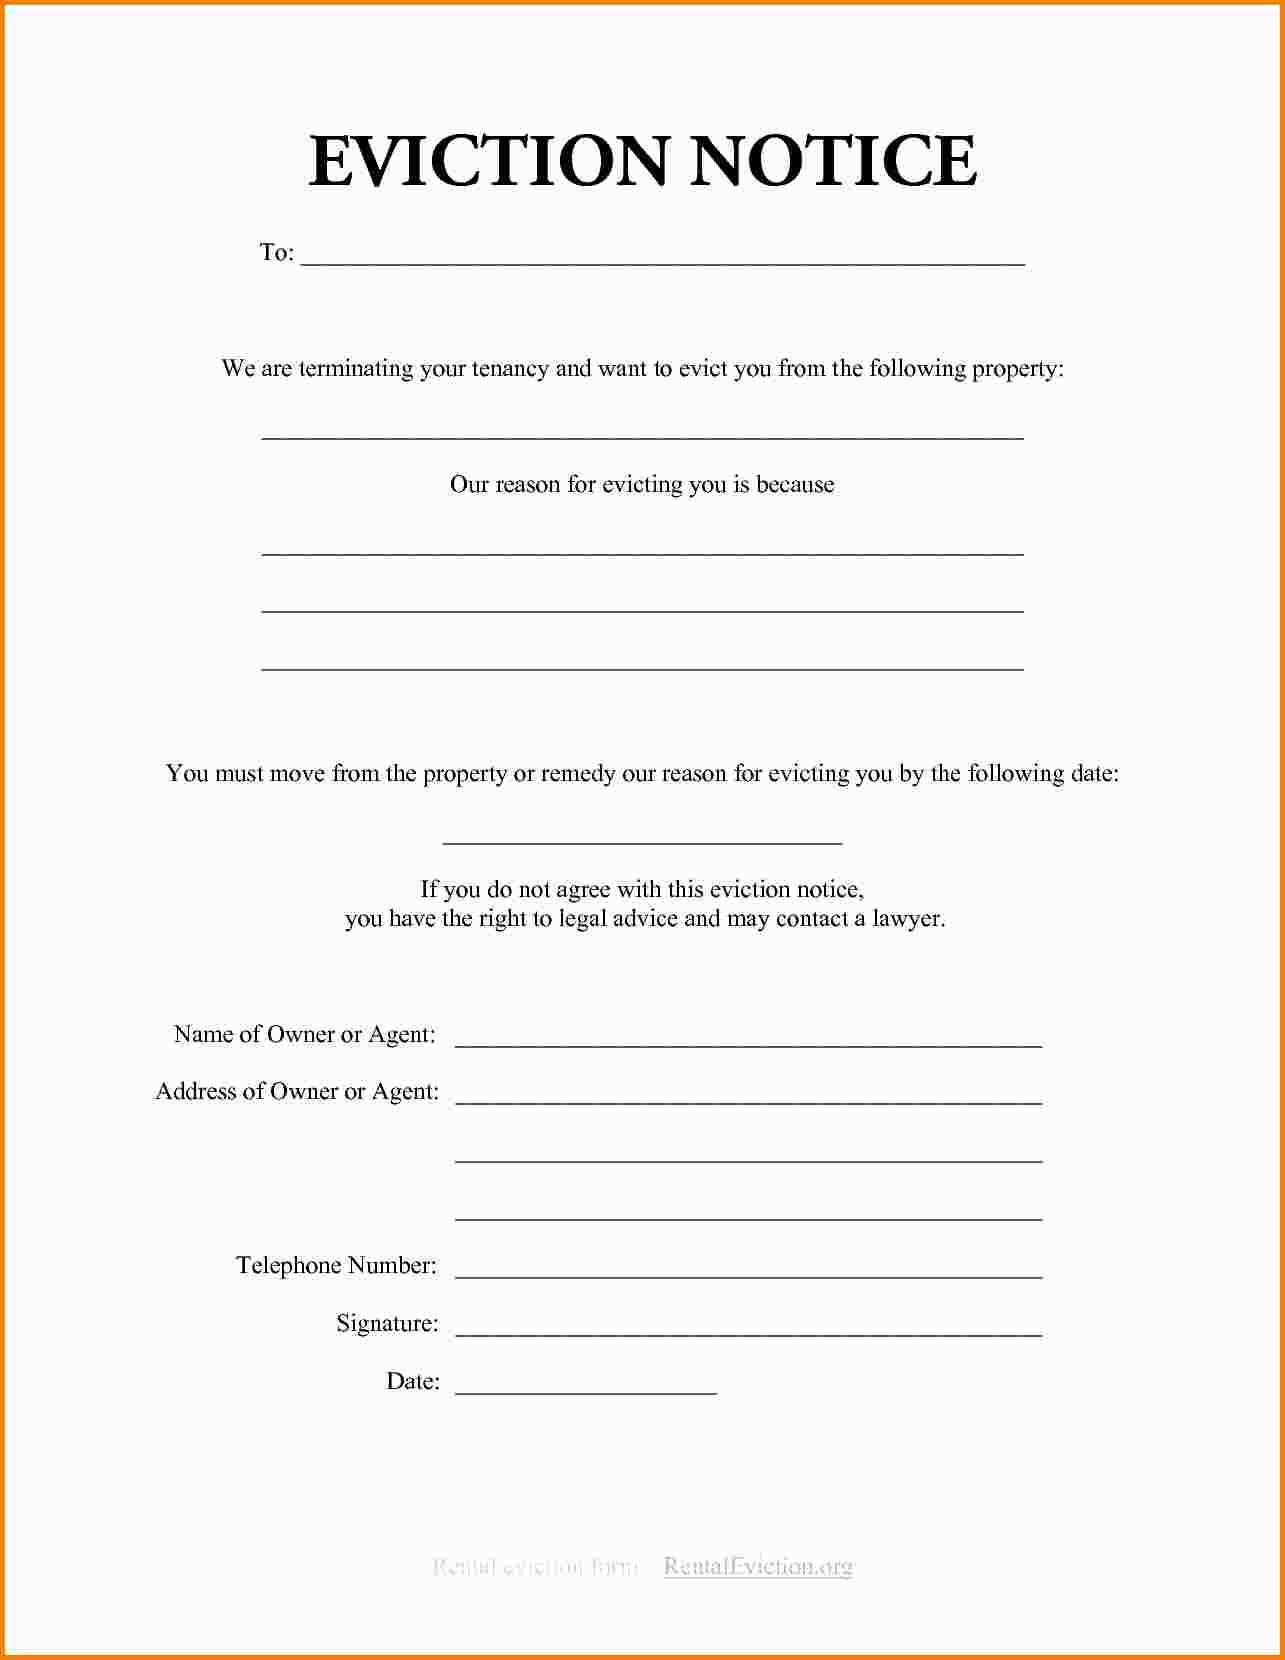 California Eviction Notice Form Pdf